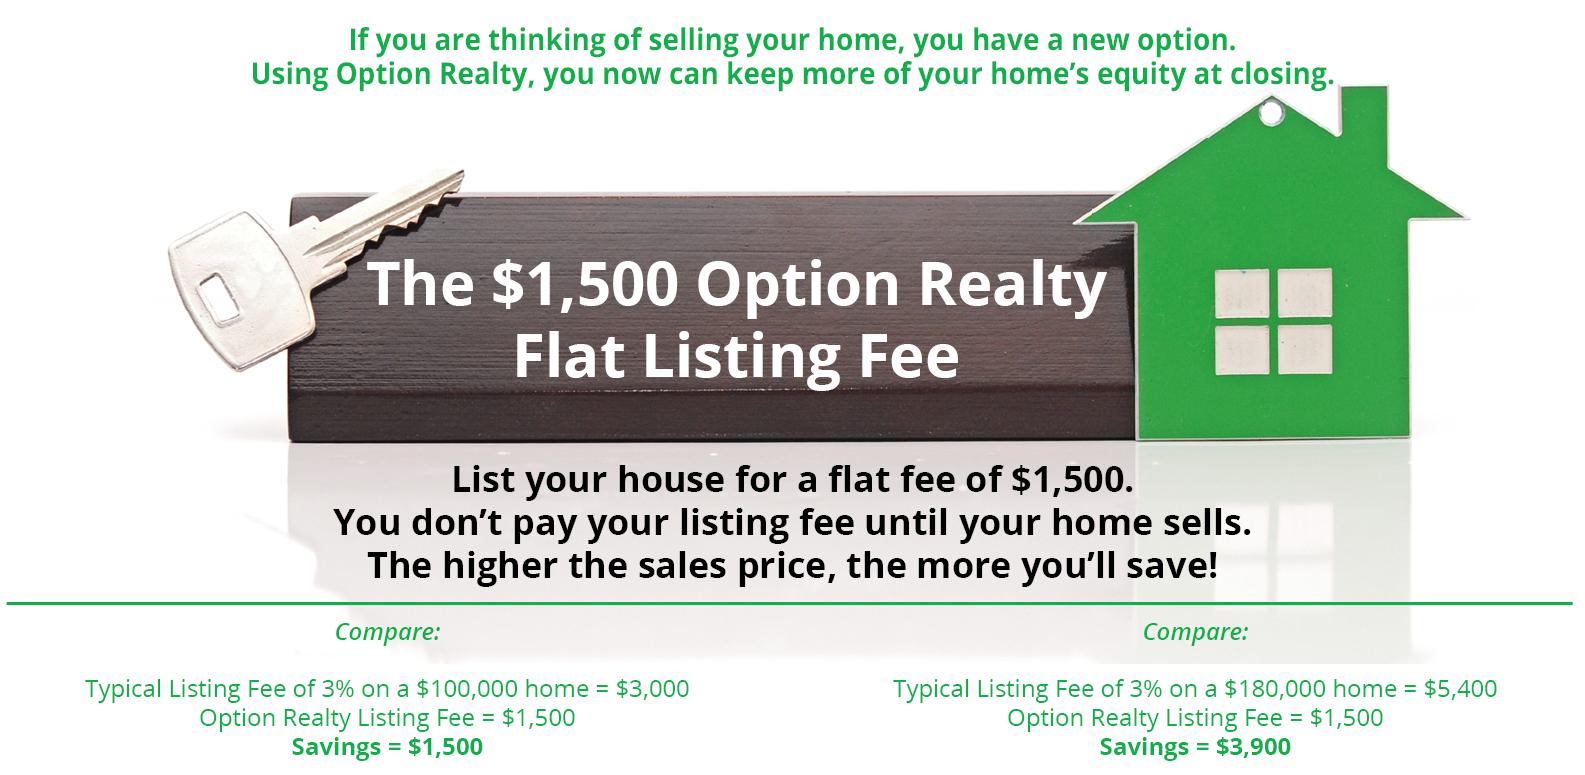 1500 flat listing fee